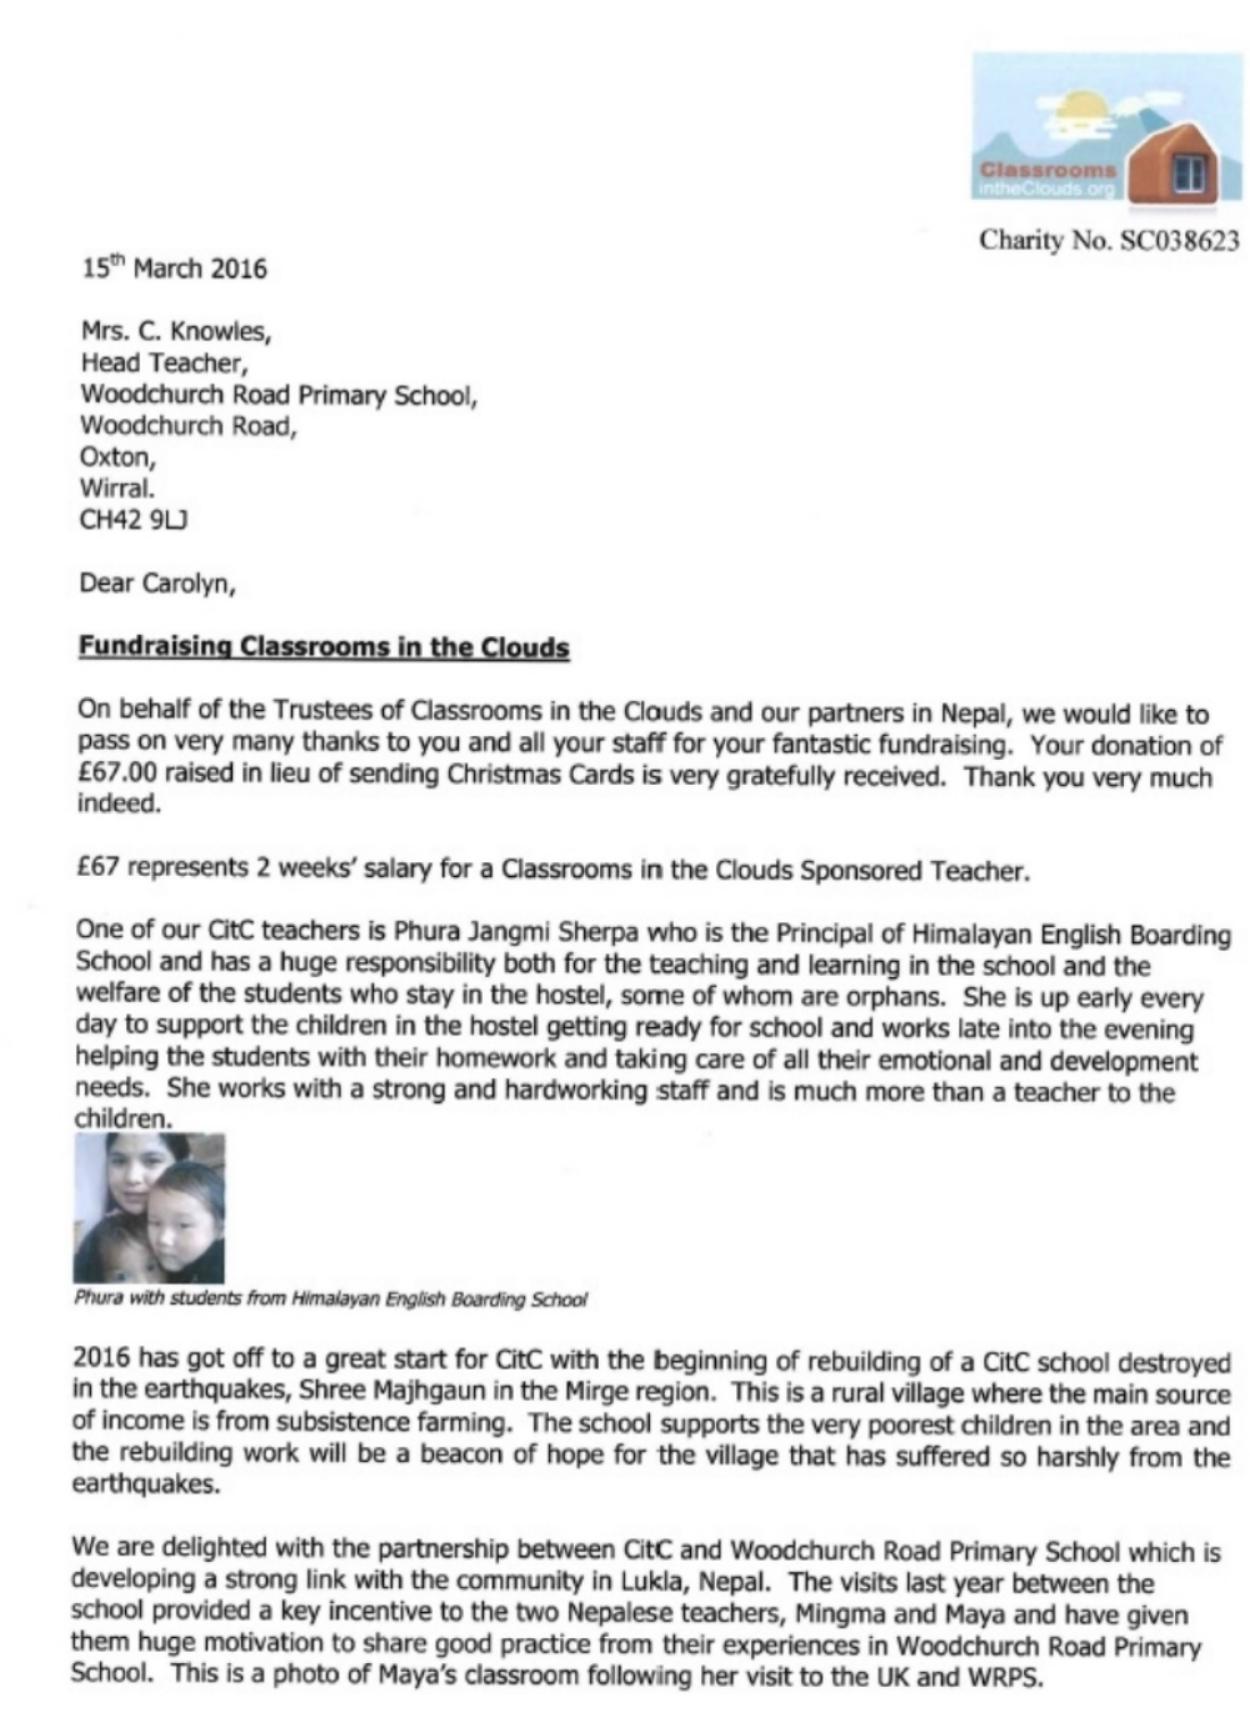 Classroominthecloudsletter15-3-16.jpg